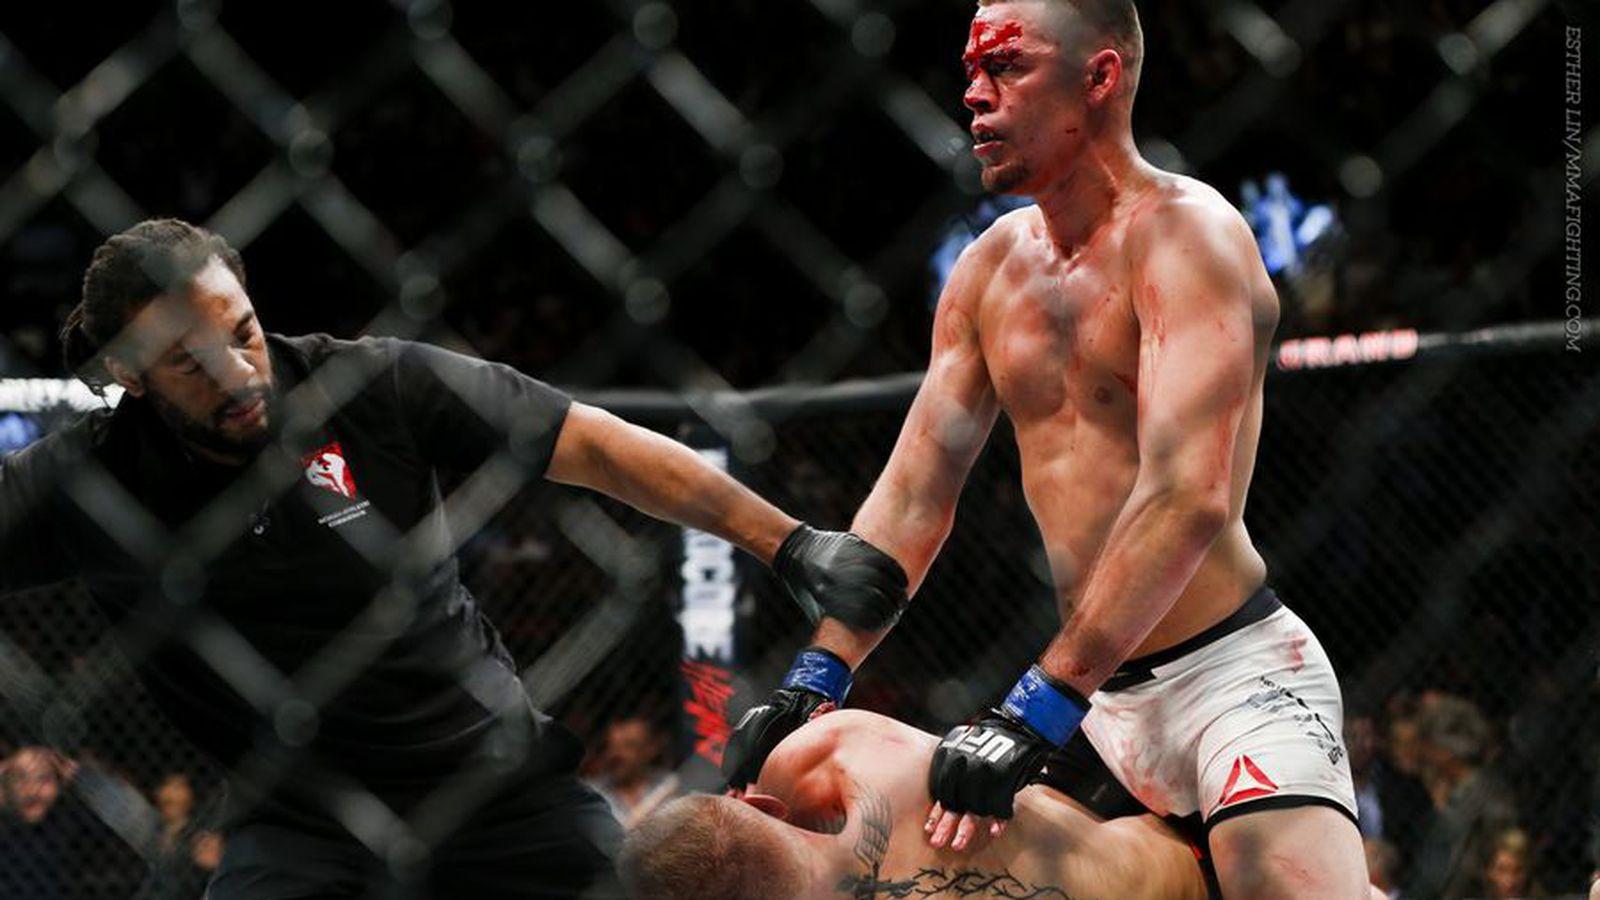 Conor mcgregor next fight date in Australia